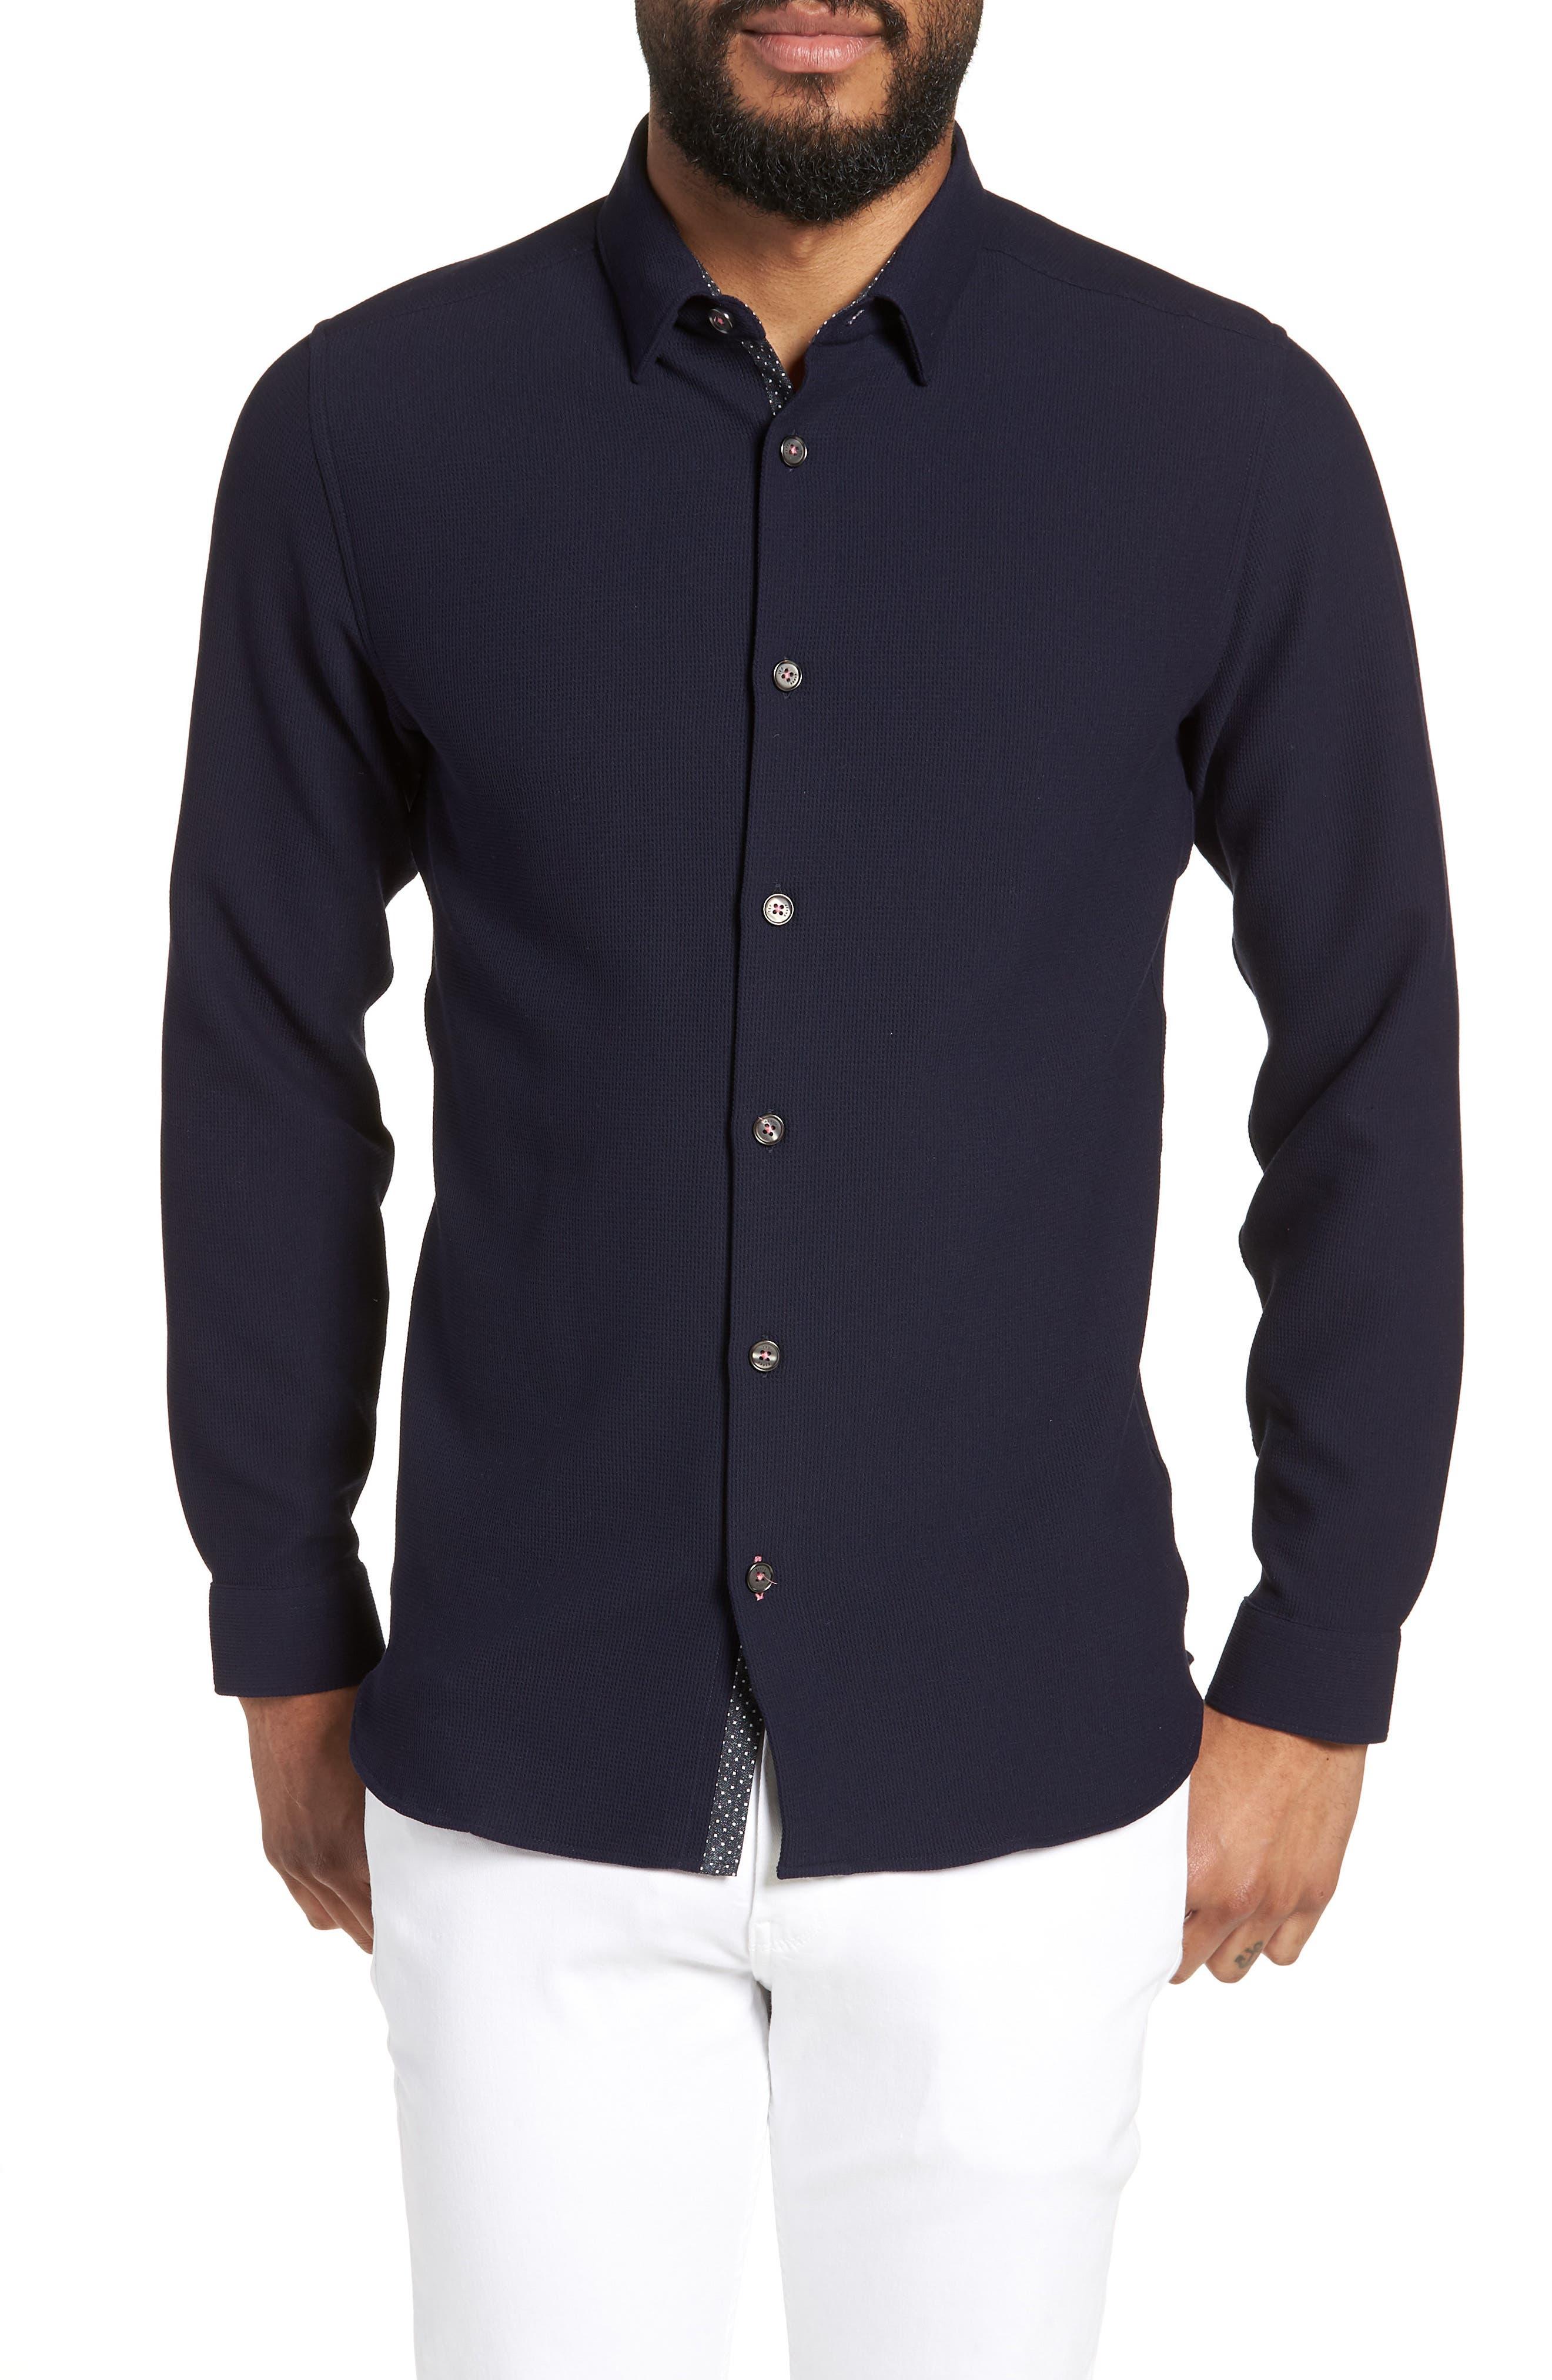 Loretax Trim Fit Stretch Knit Sport Shirt,                             Main thumbnail 1, color,